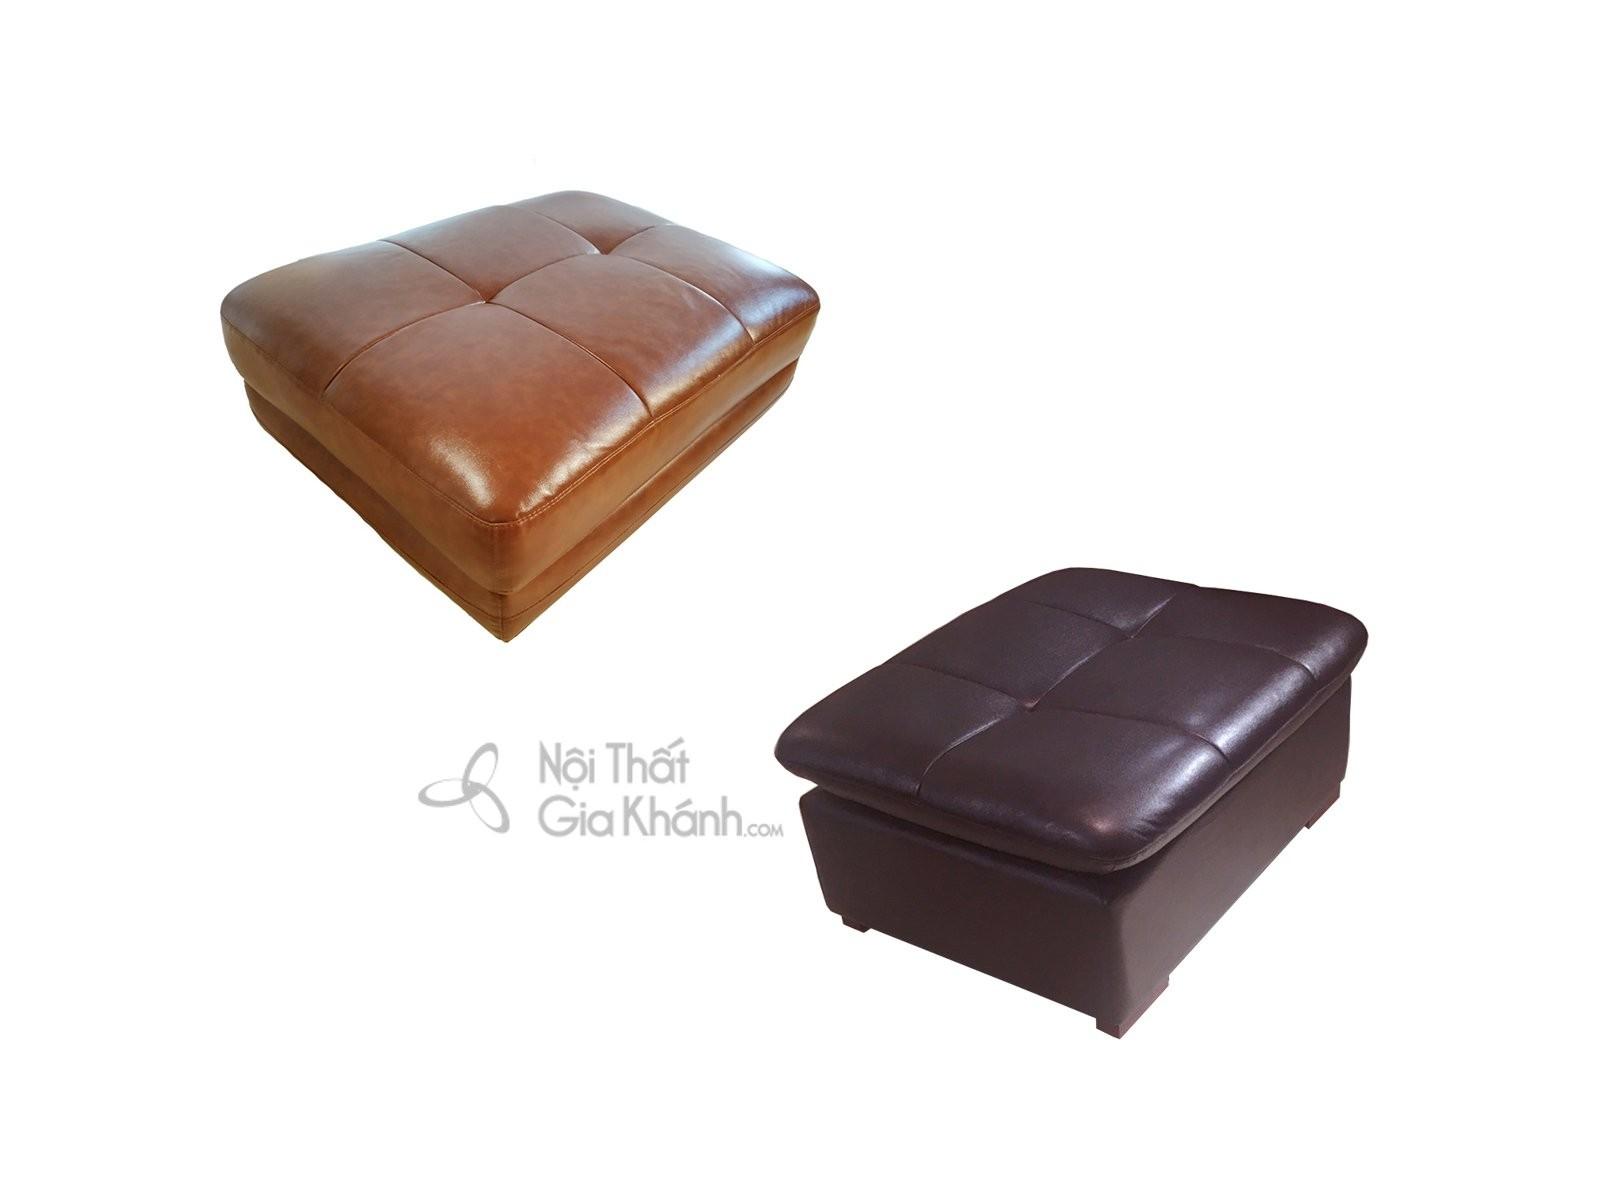 Sofa góc bằng da bò 2 băng nhập khẩu cao cấp SF902-2B - bo sofa 2 bang da bo nhap khau cao cap sf919 2b